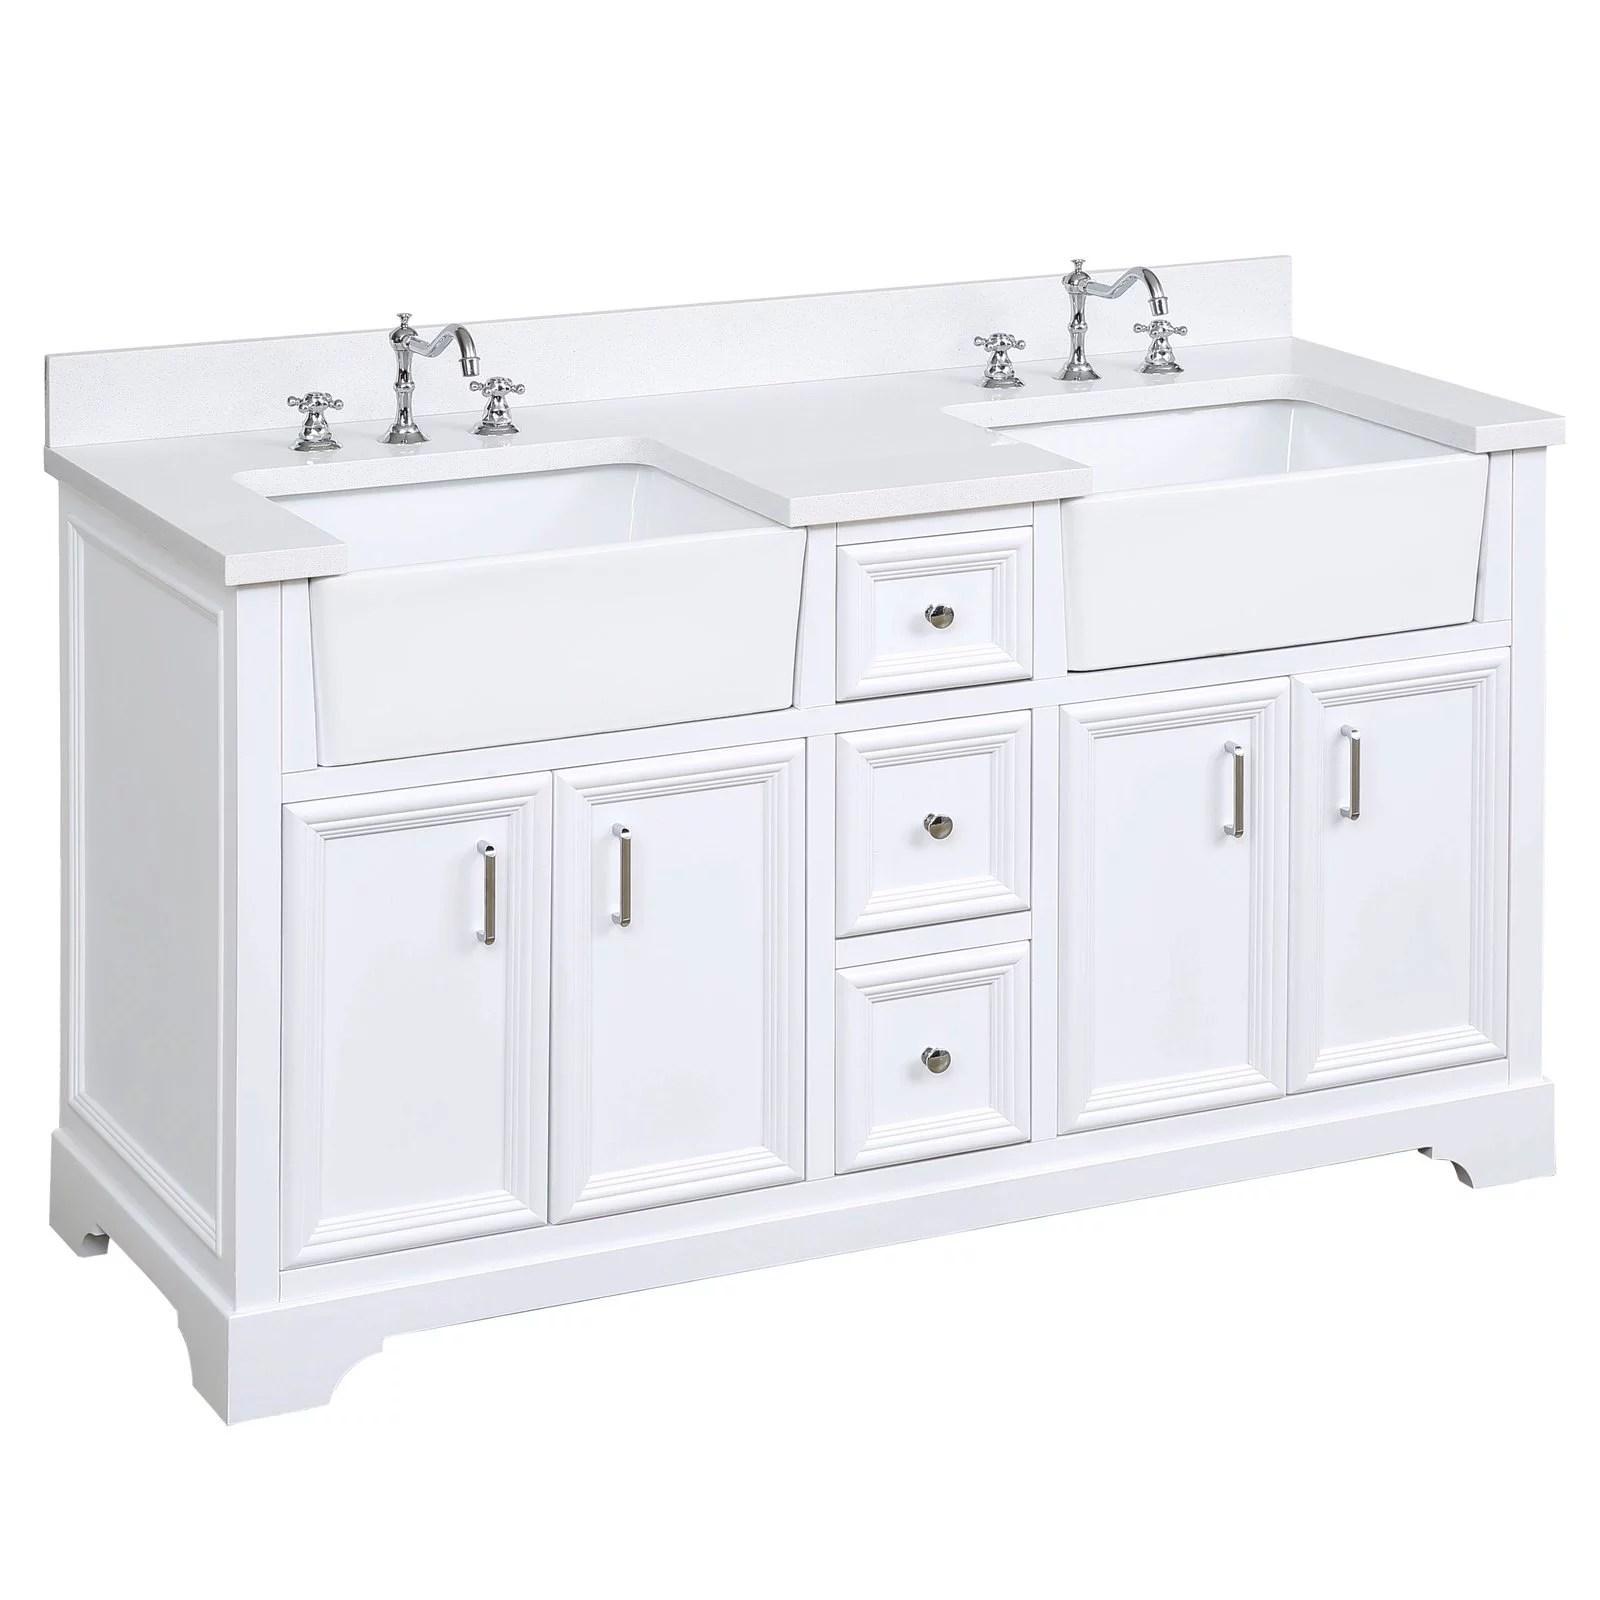 Includes A Quartz Countertop And White Ceramic Farmhouse Apron Sink Quartz Powder Gray Powder Gray Cabinet With Soft Close Doors Drawers Zelda 60 Inch Single Bathroom Vanity Bathroom Vanities